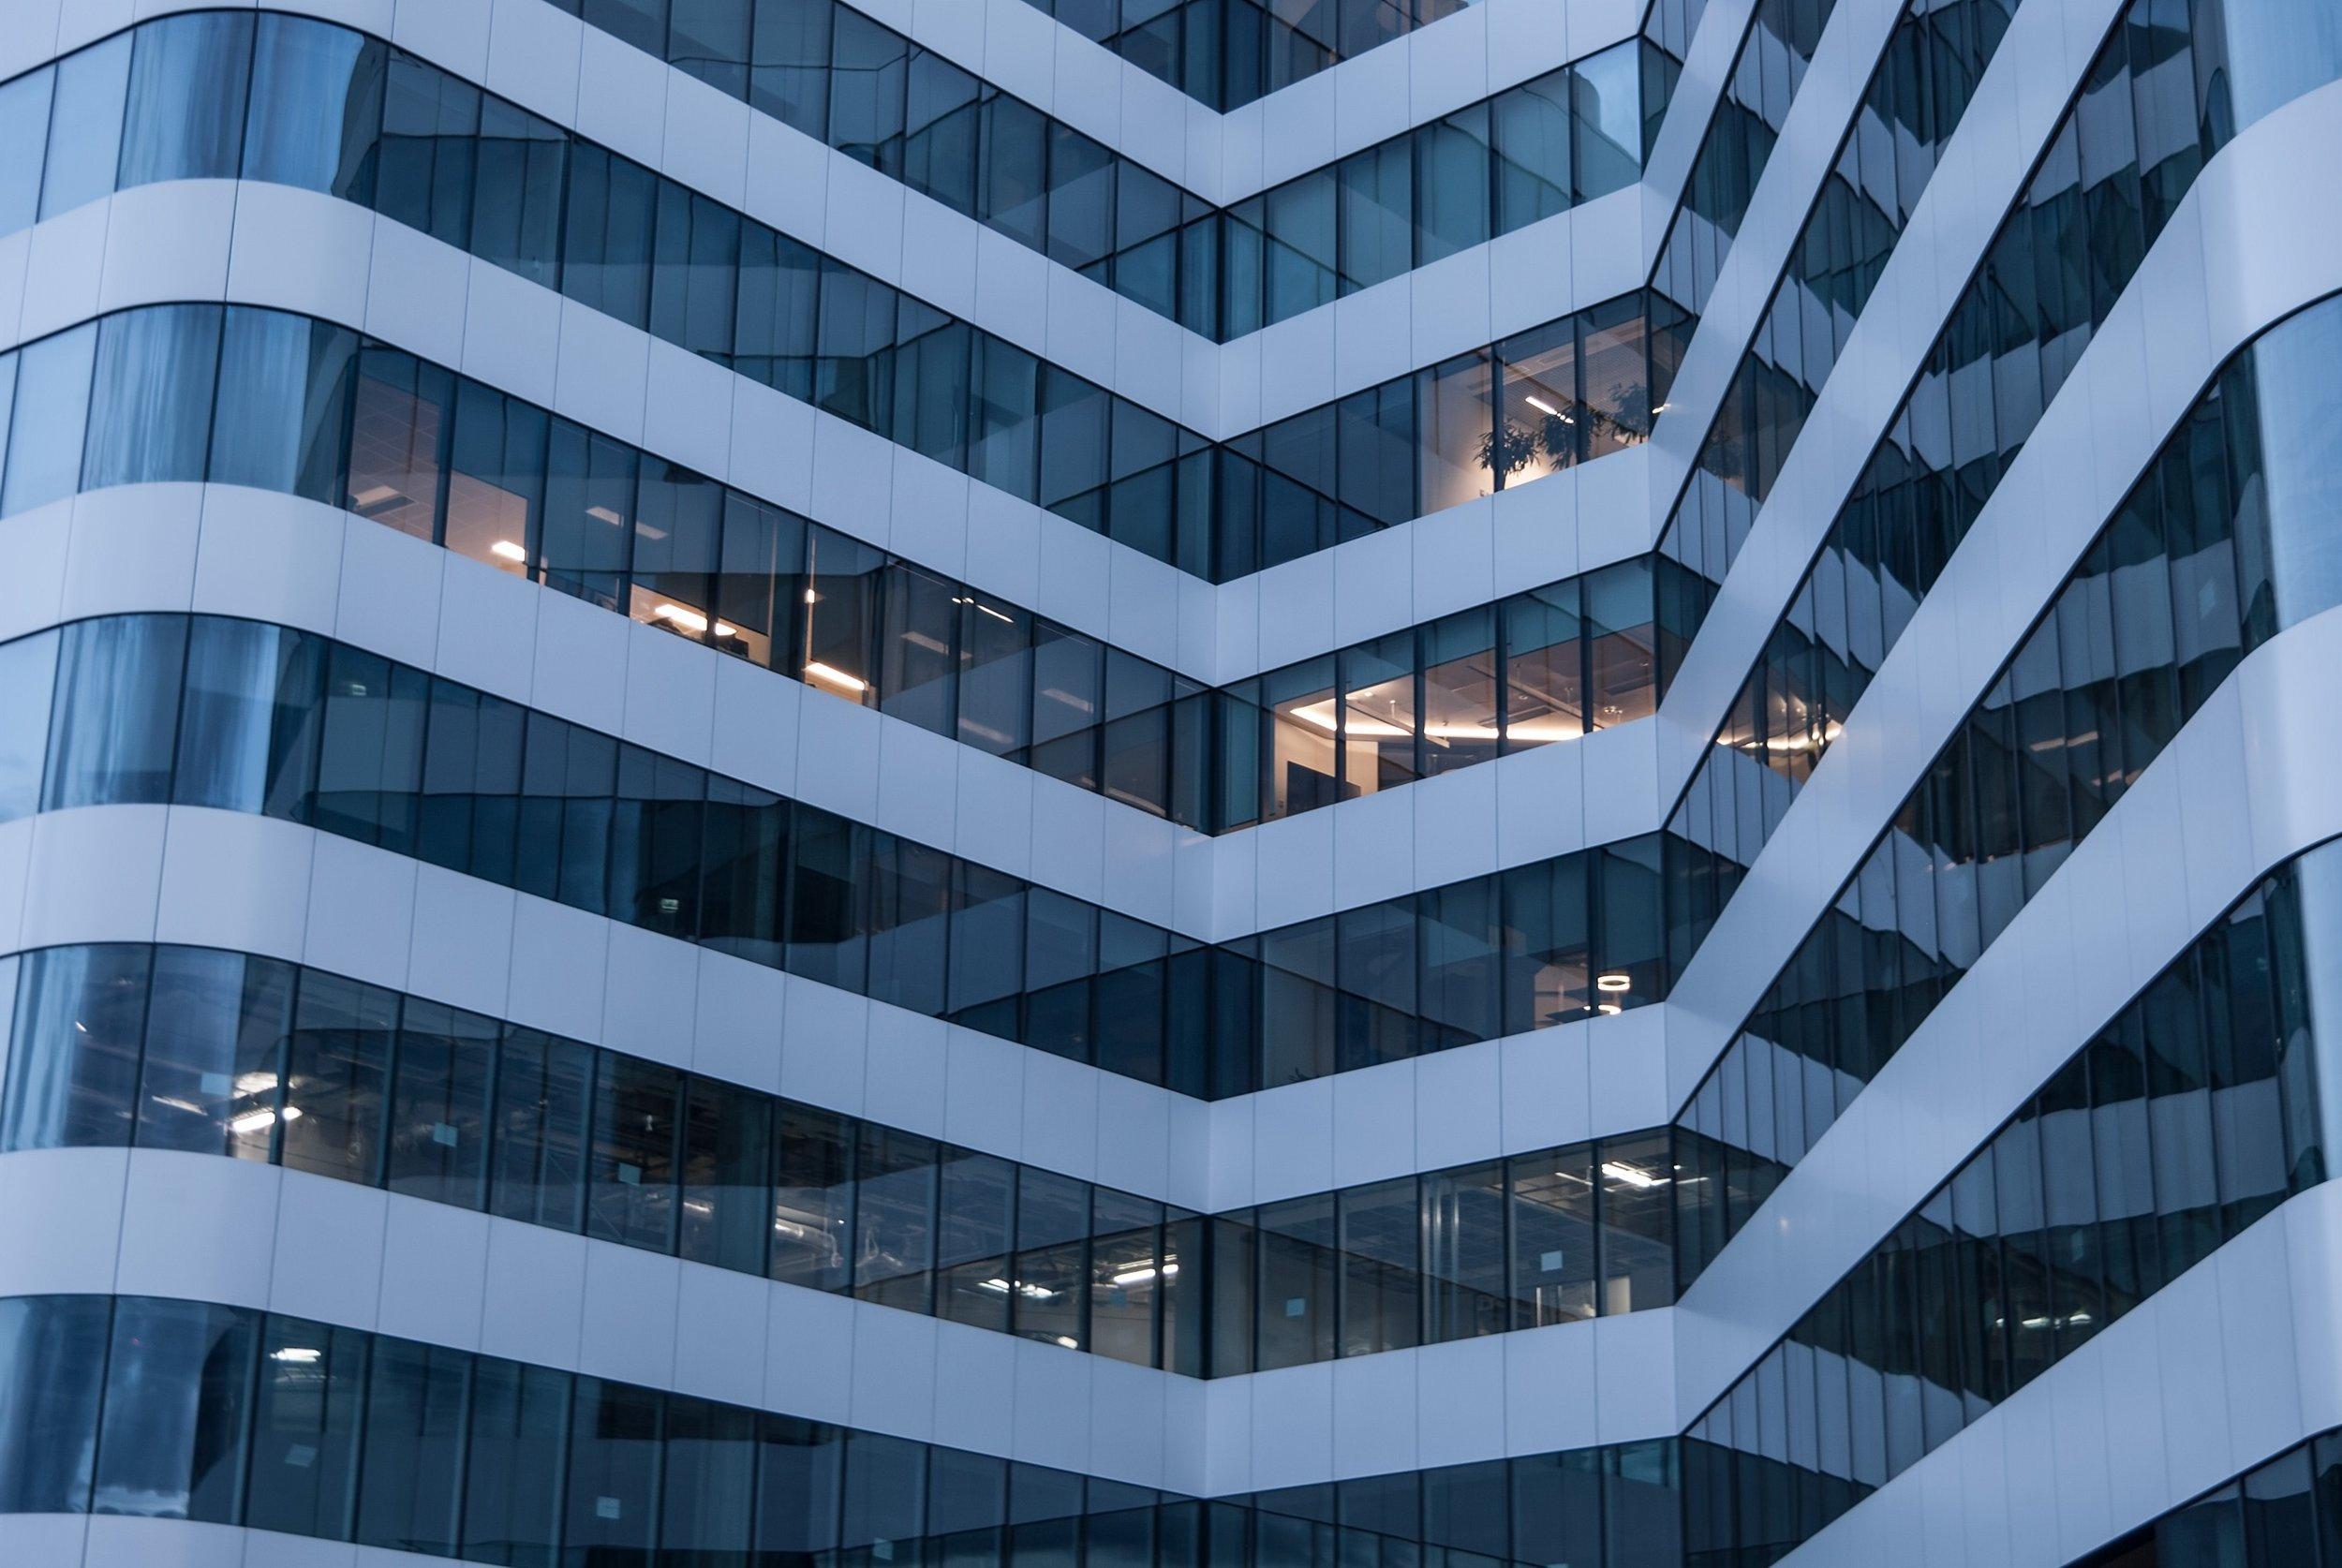 architectural-design-architecture-building-417352.jpg